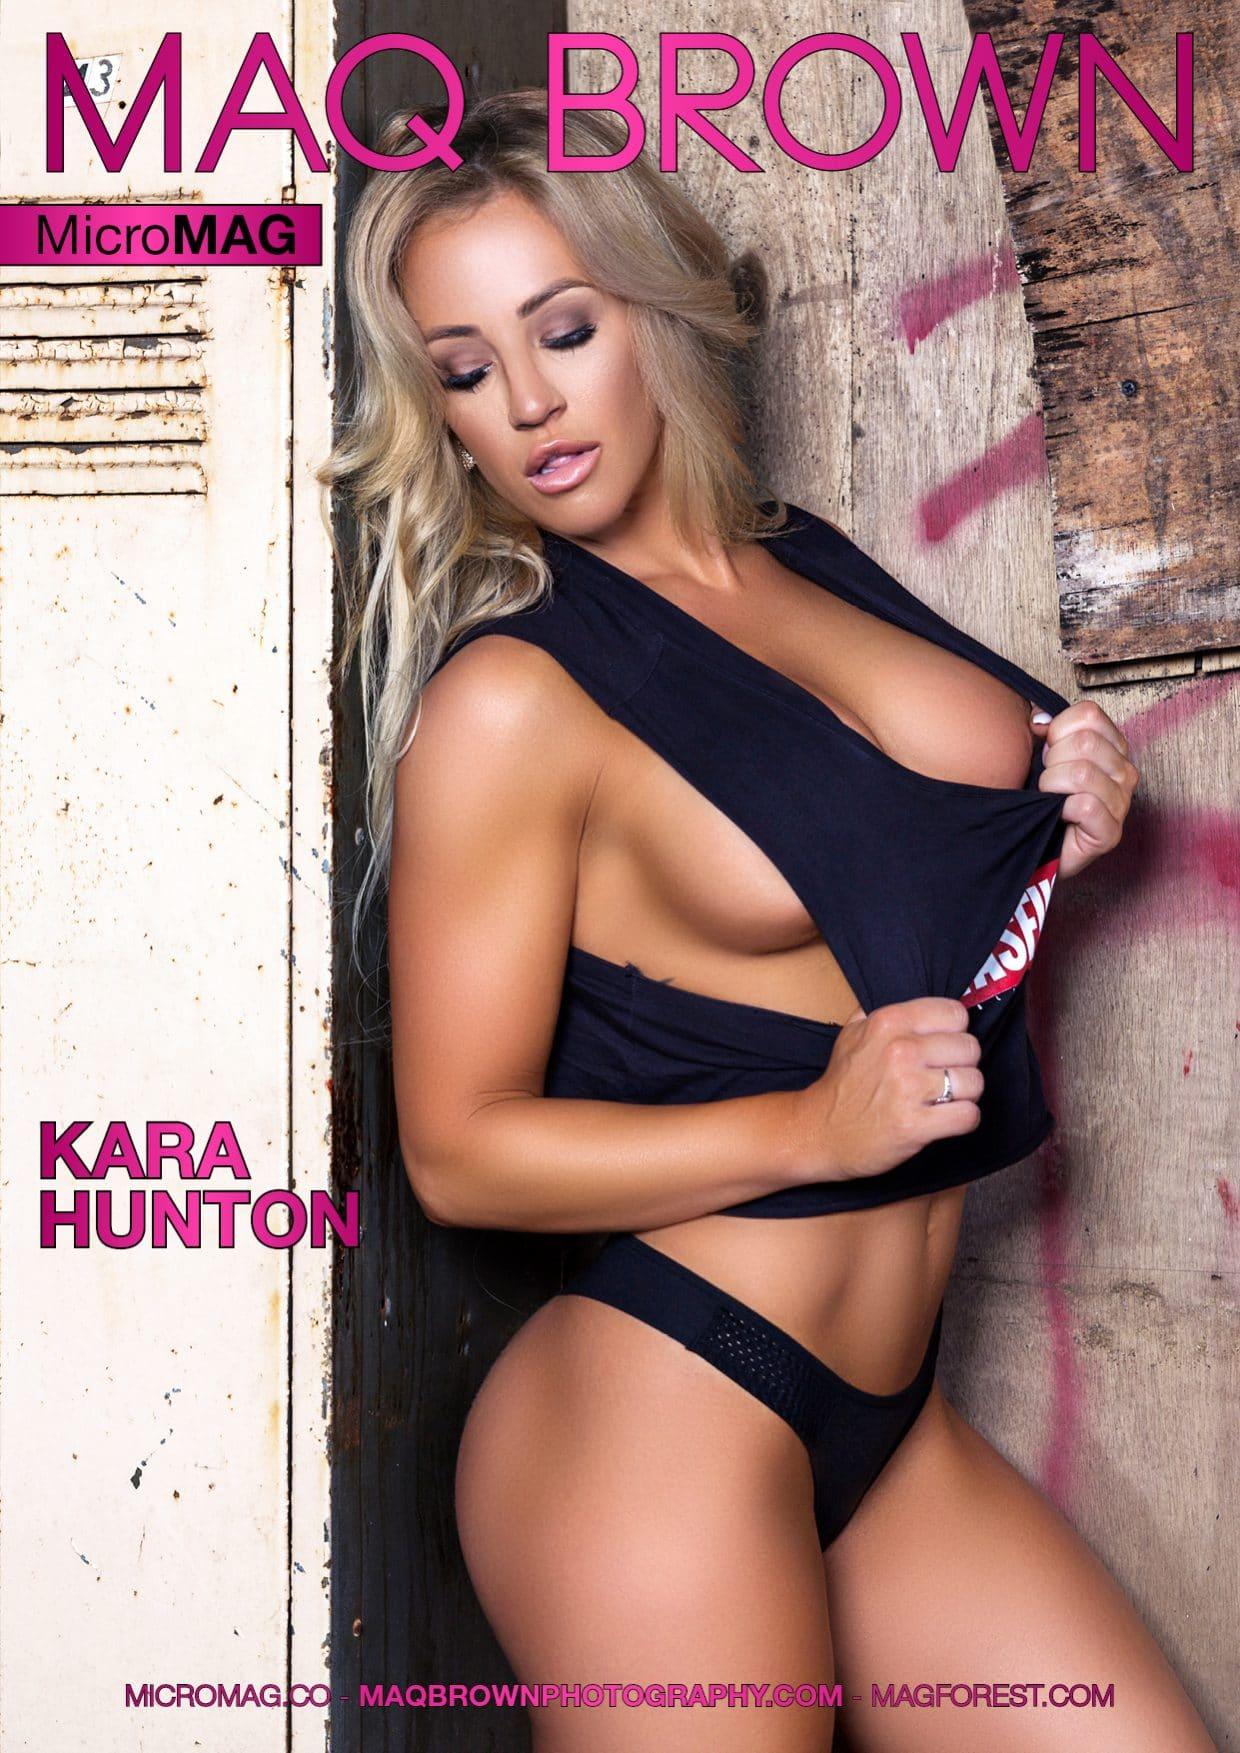 Maq Brown Micromag – Kara Hunton